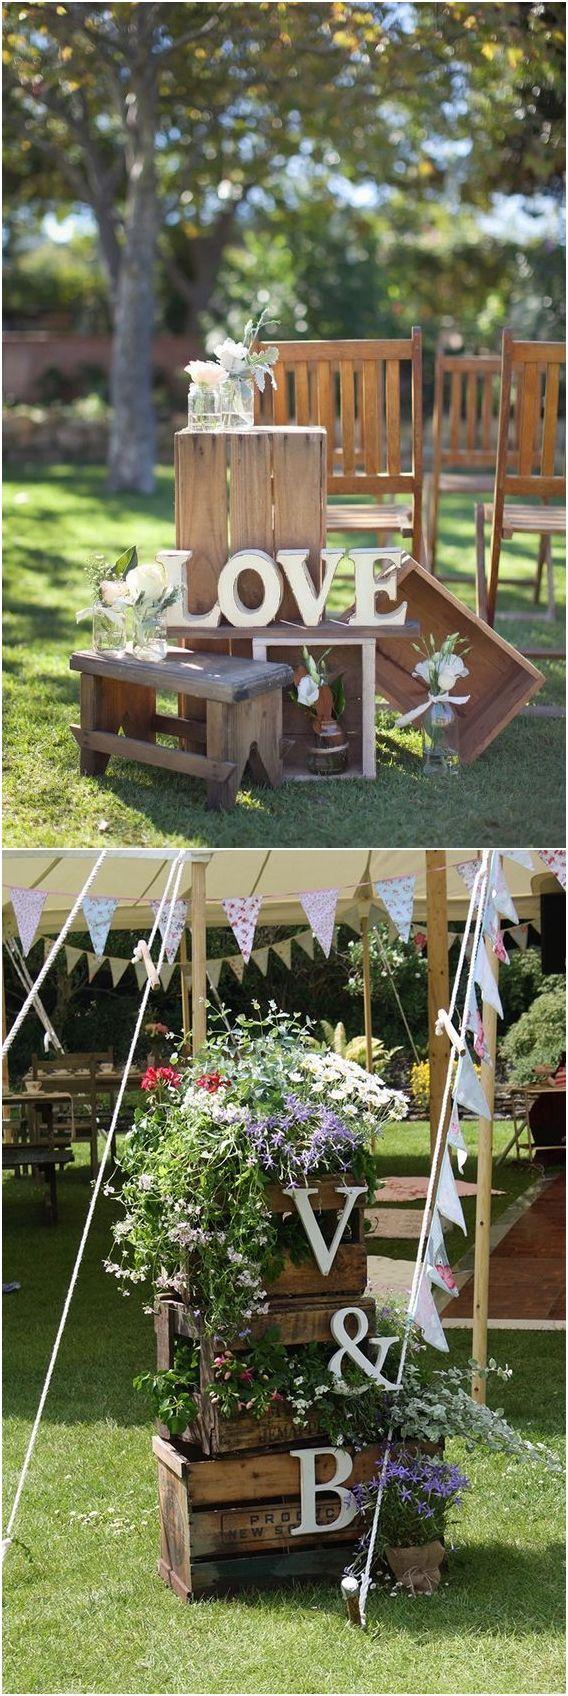 Wedding decor ideas 2018  Rustic Woodsy Wedding Trend  Wooden Crates  Woodsy wedding